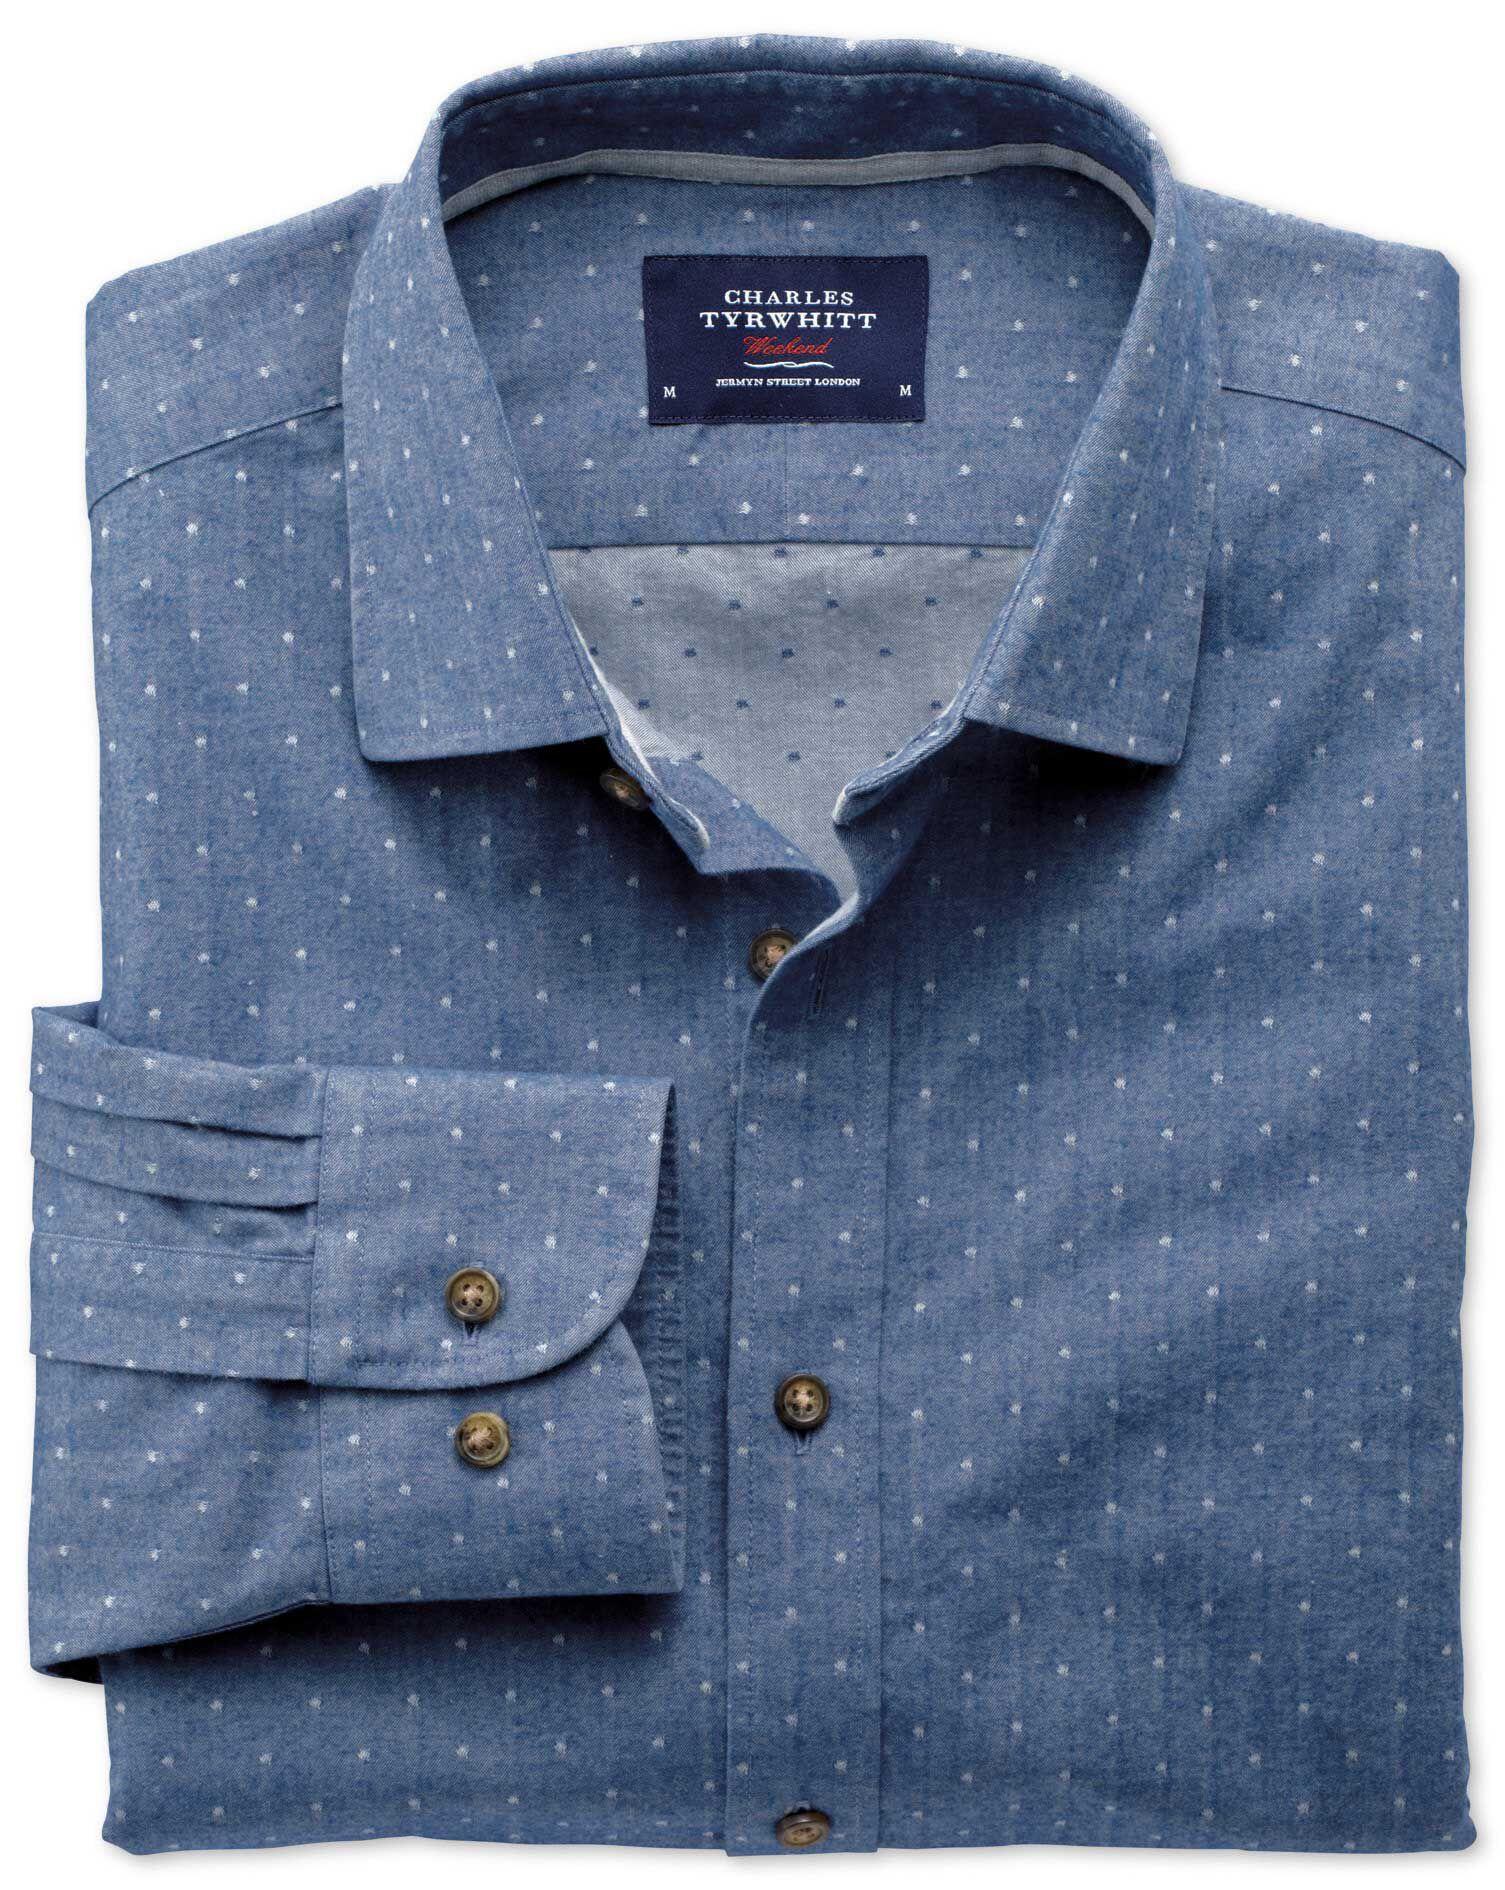 Extra Slim Fit Mid Blue Dobby Spot Cotton Shirt Single Cuff Size XS by Charles Tyrwhitt